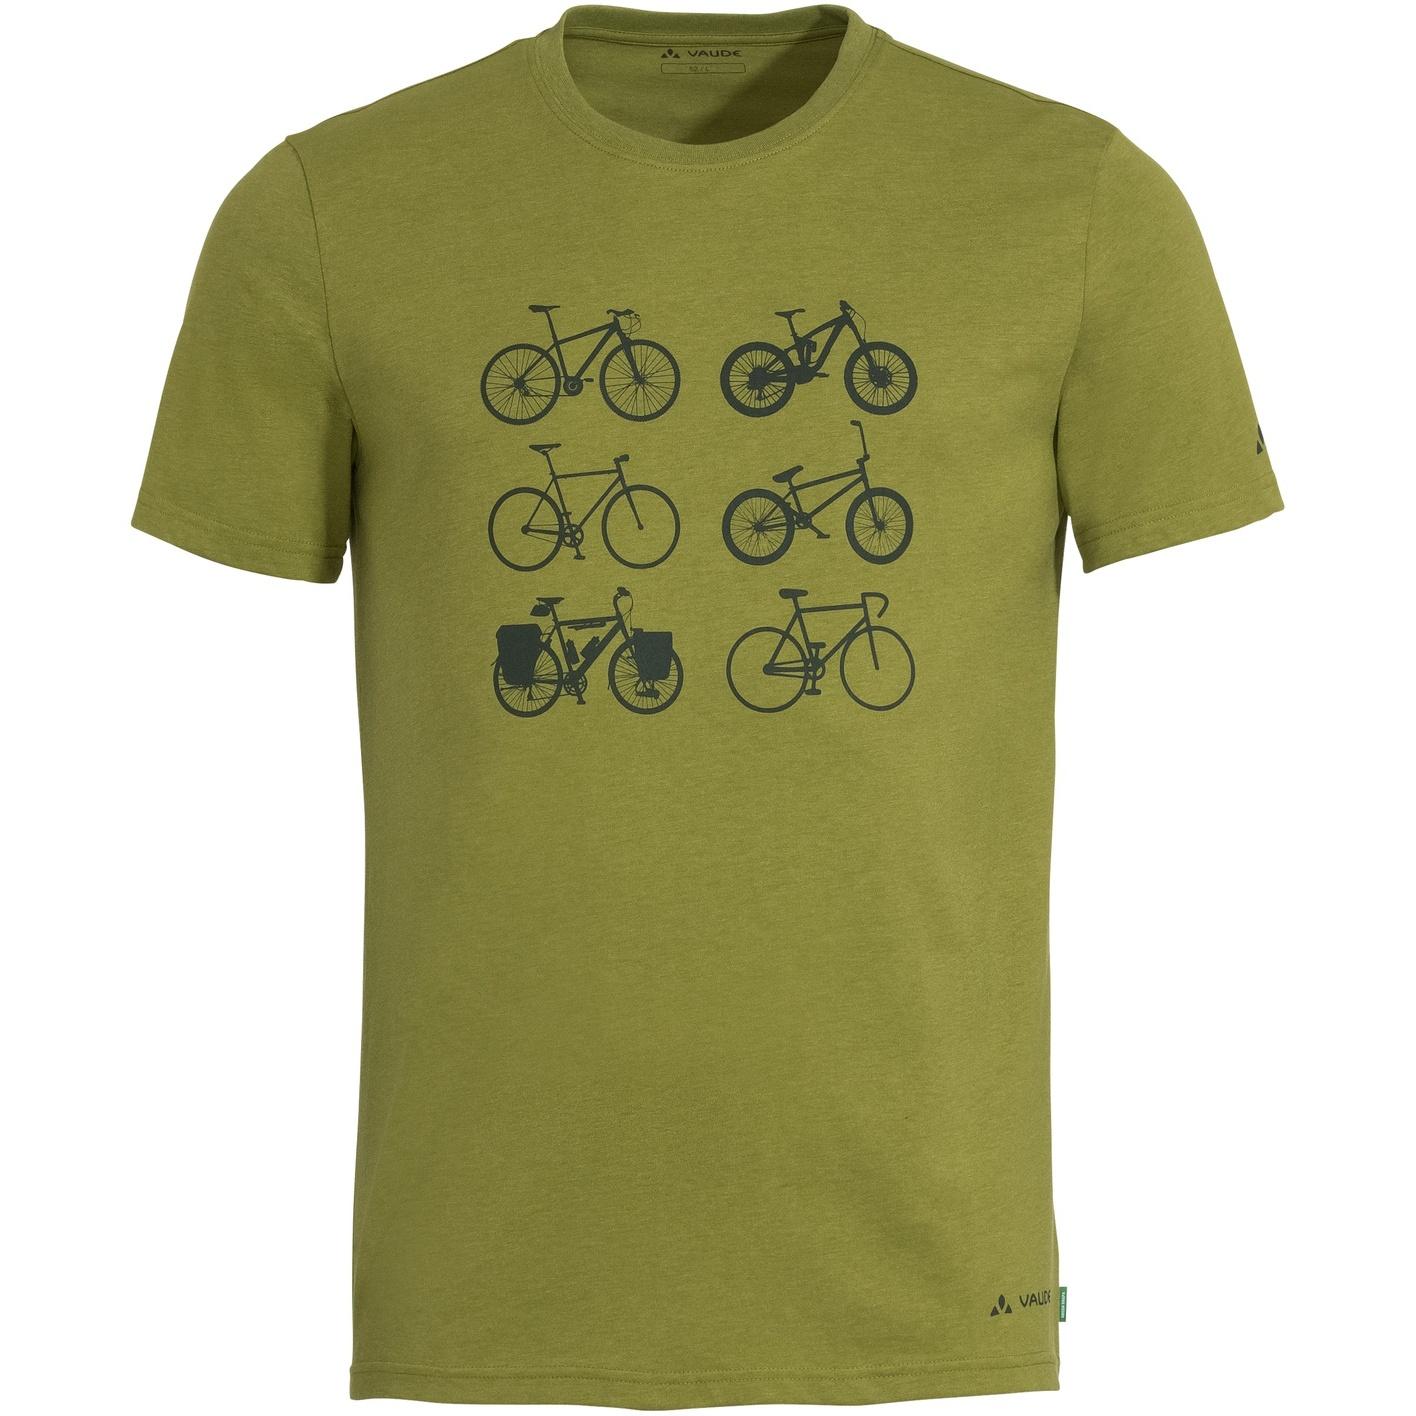 Bild von Vaude Cyclist T-Shirt V - avocado